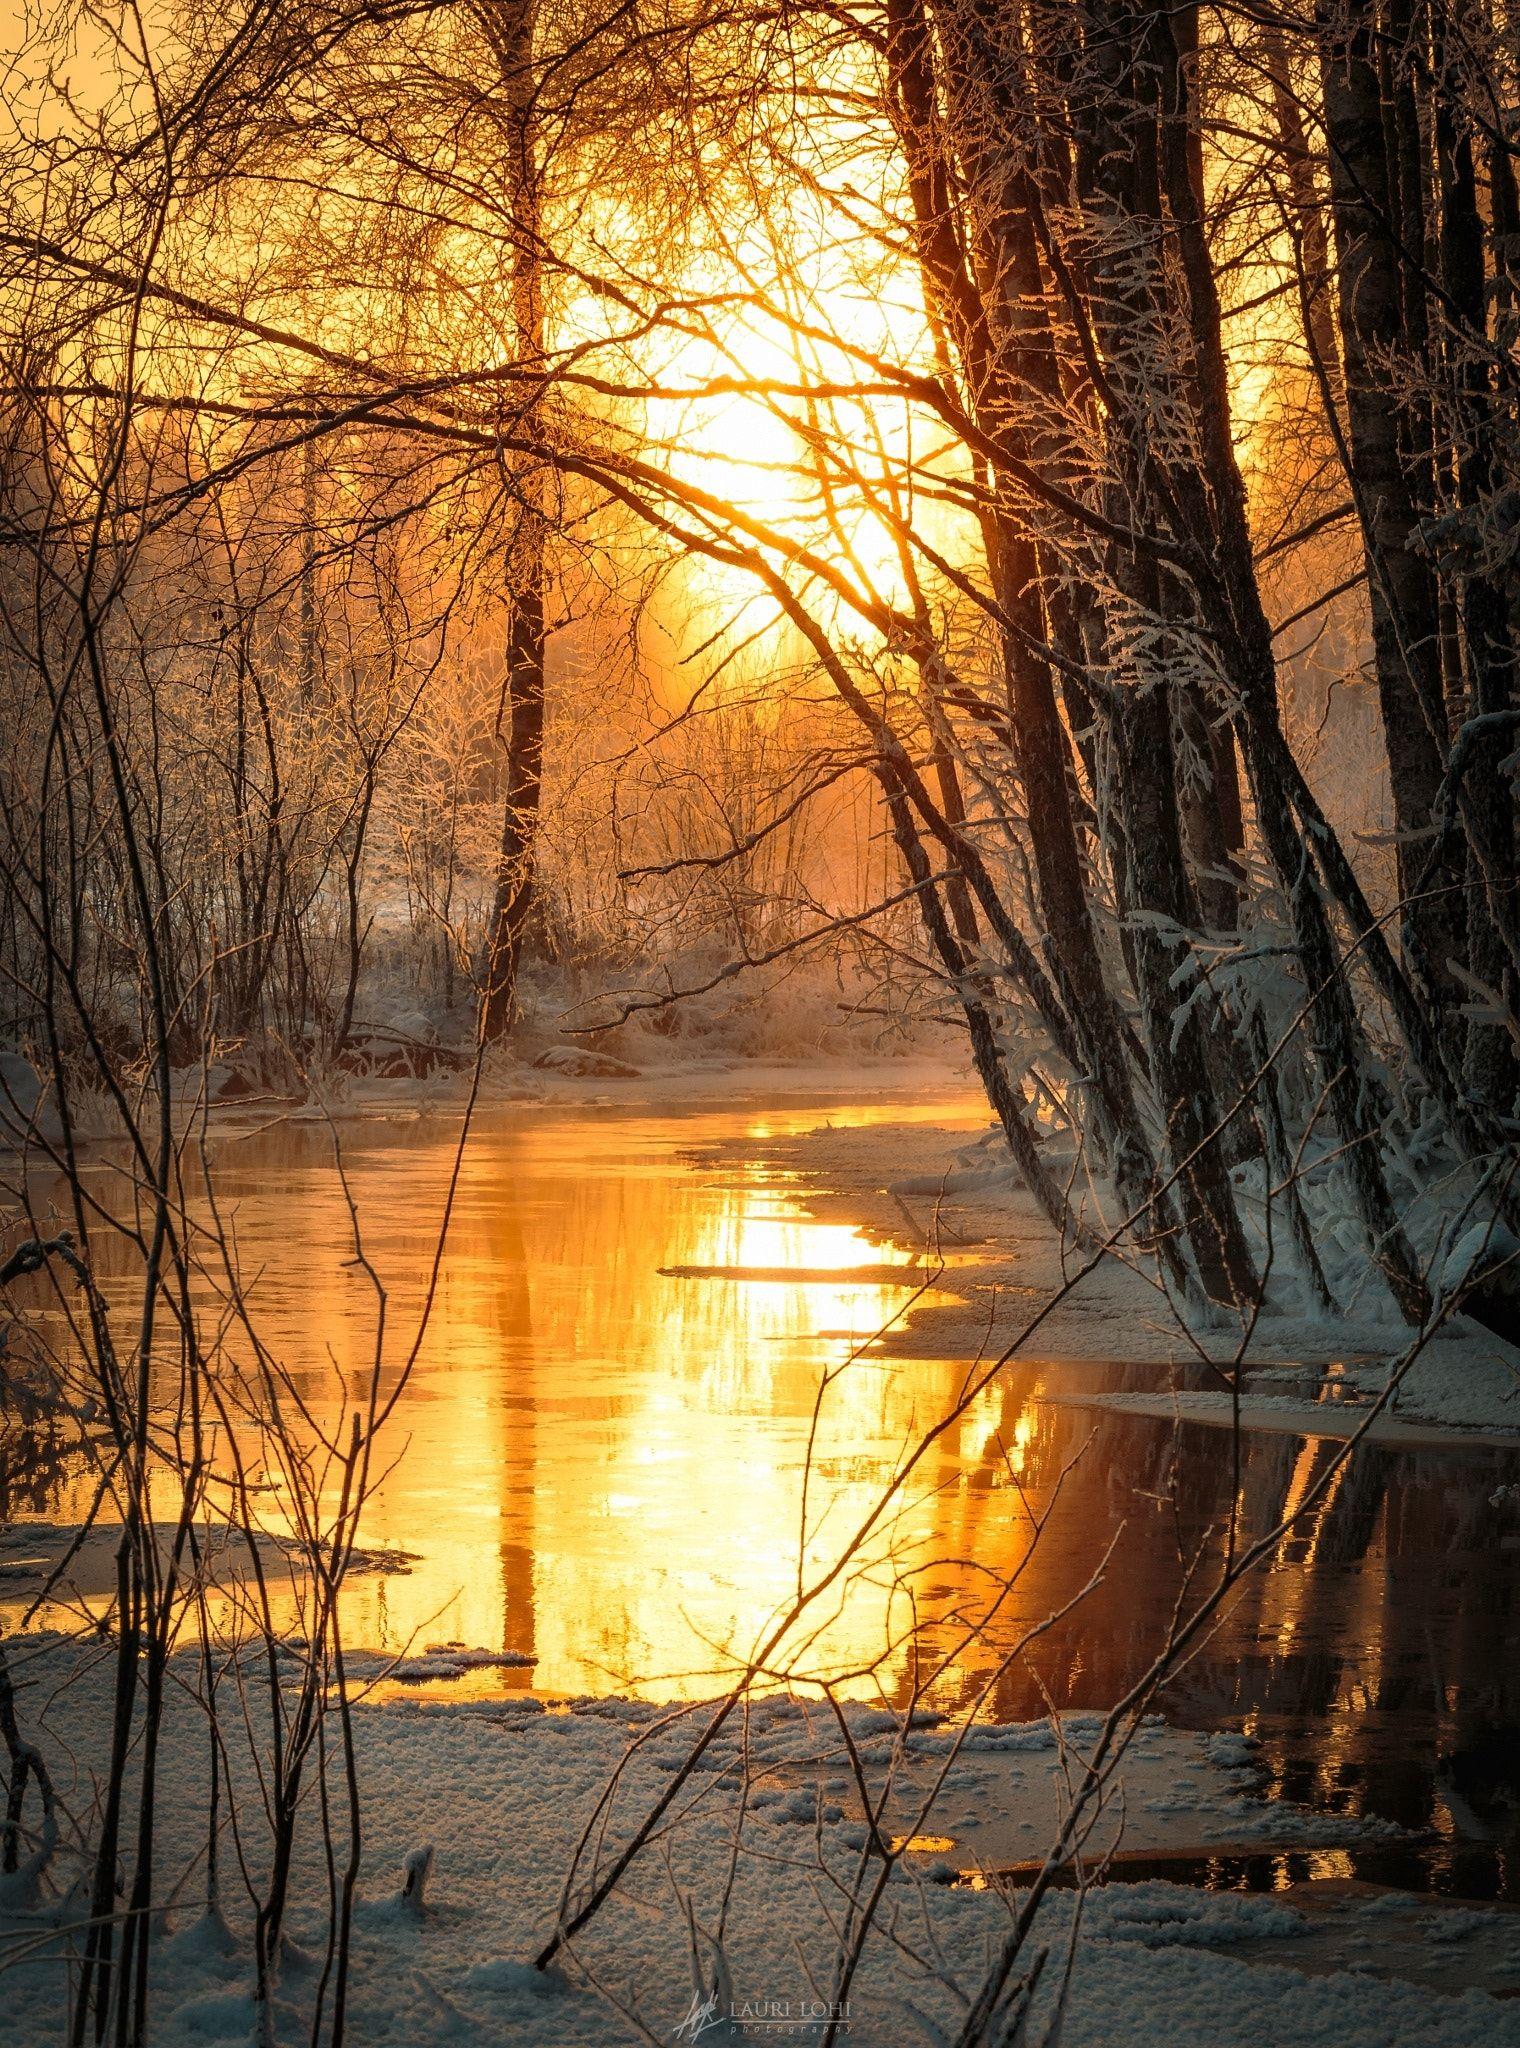 Beautiful Winter Outfit Www Pinterest Com: Beautiful Winter Morning Light Reflecting